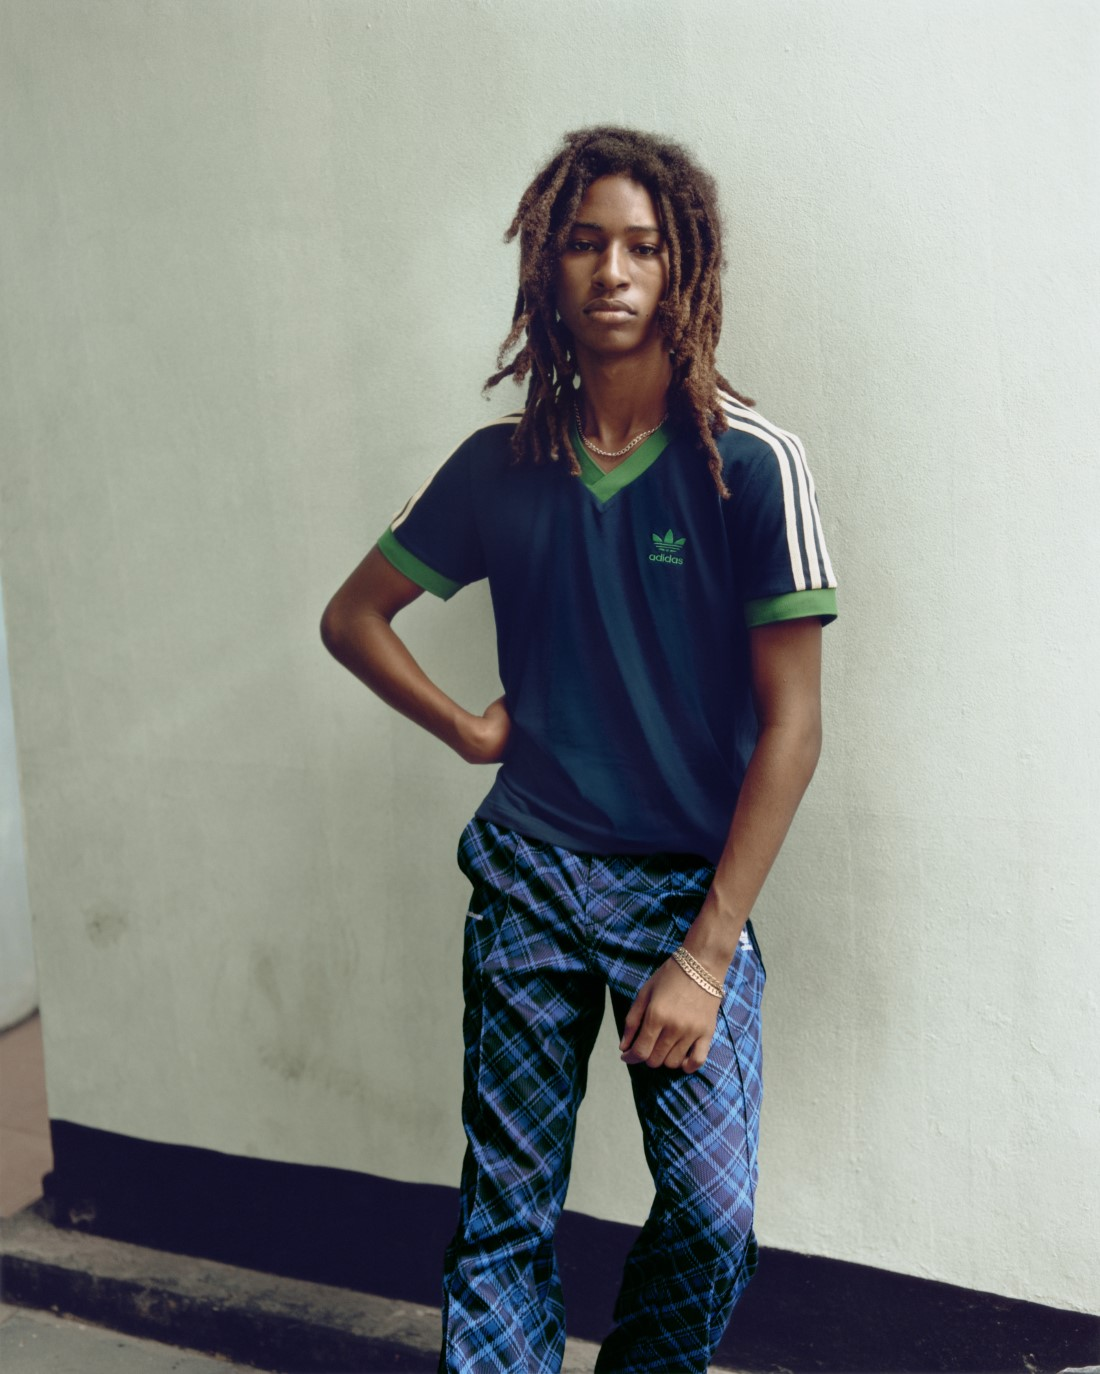 adidas Originals x WALES BONNER Printemps-Été 2021